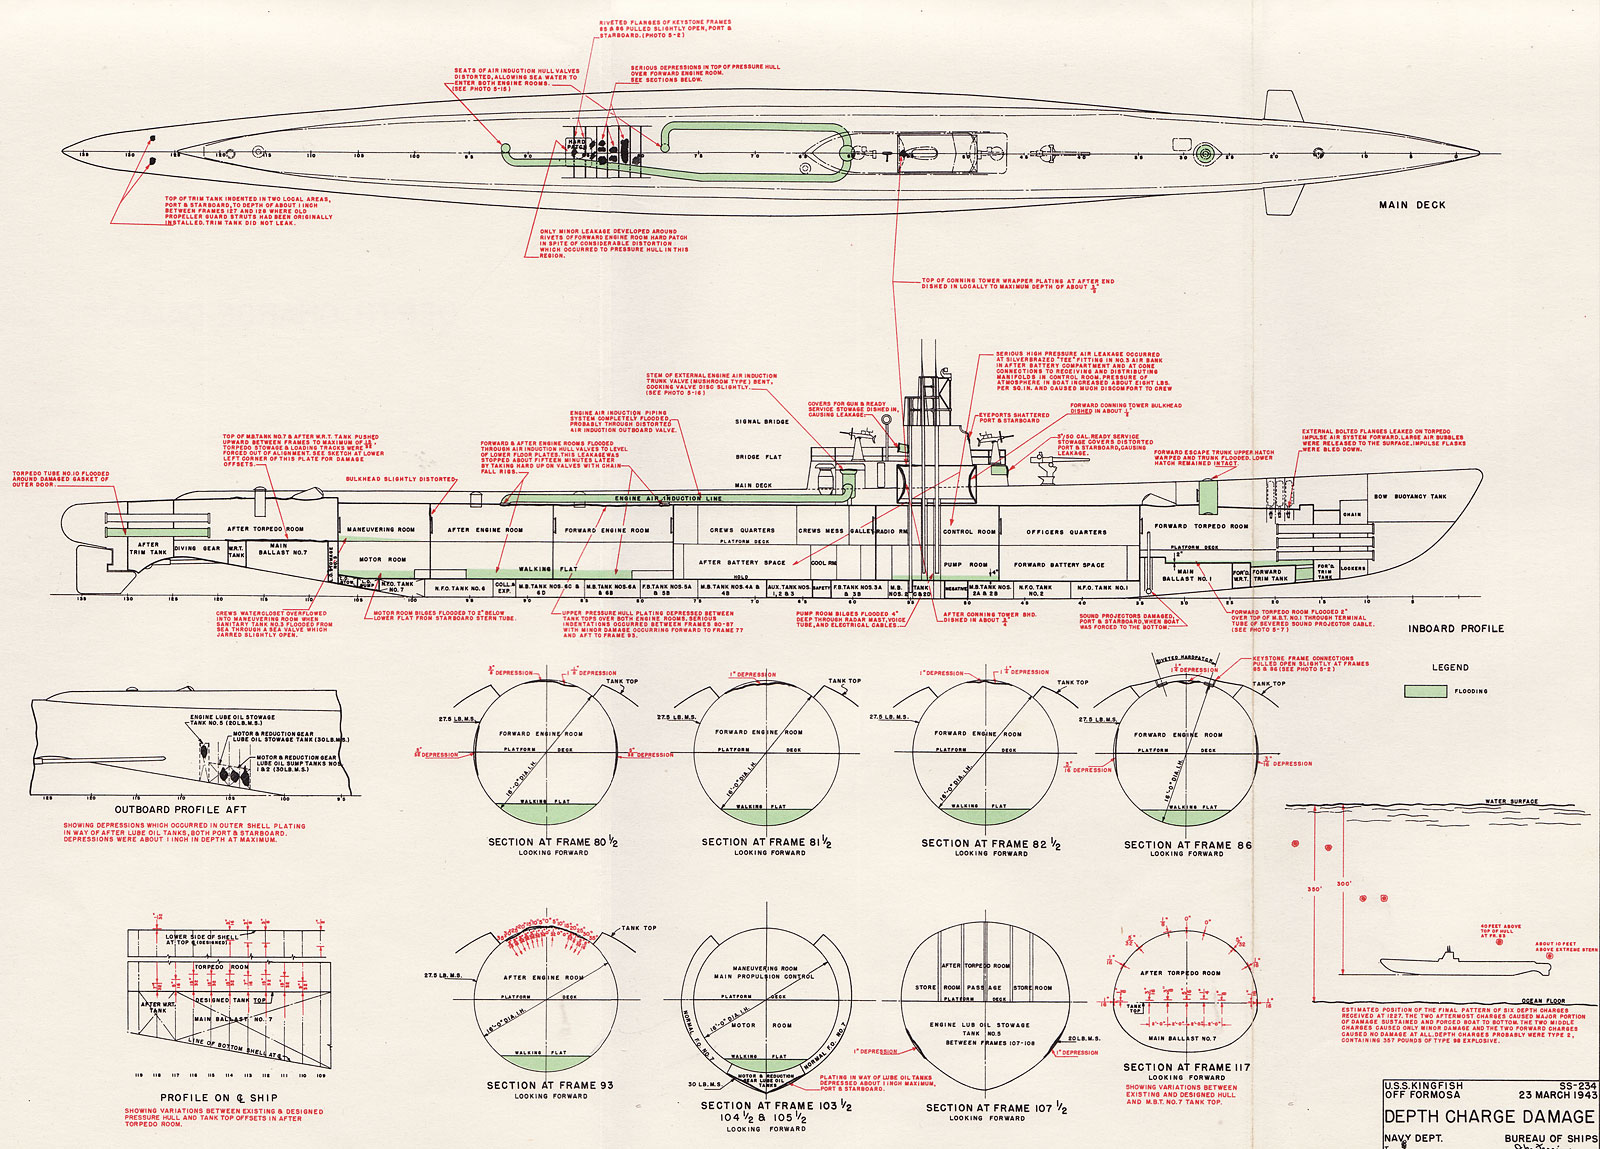 hyperwar war damage report 58 submarine report section v